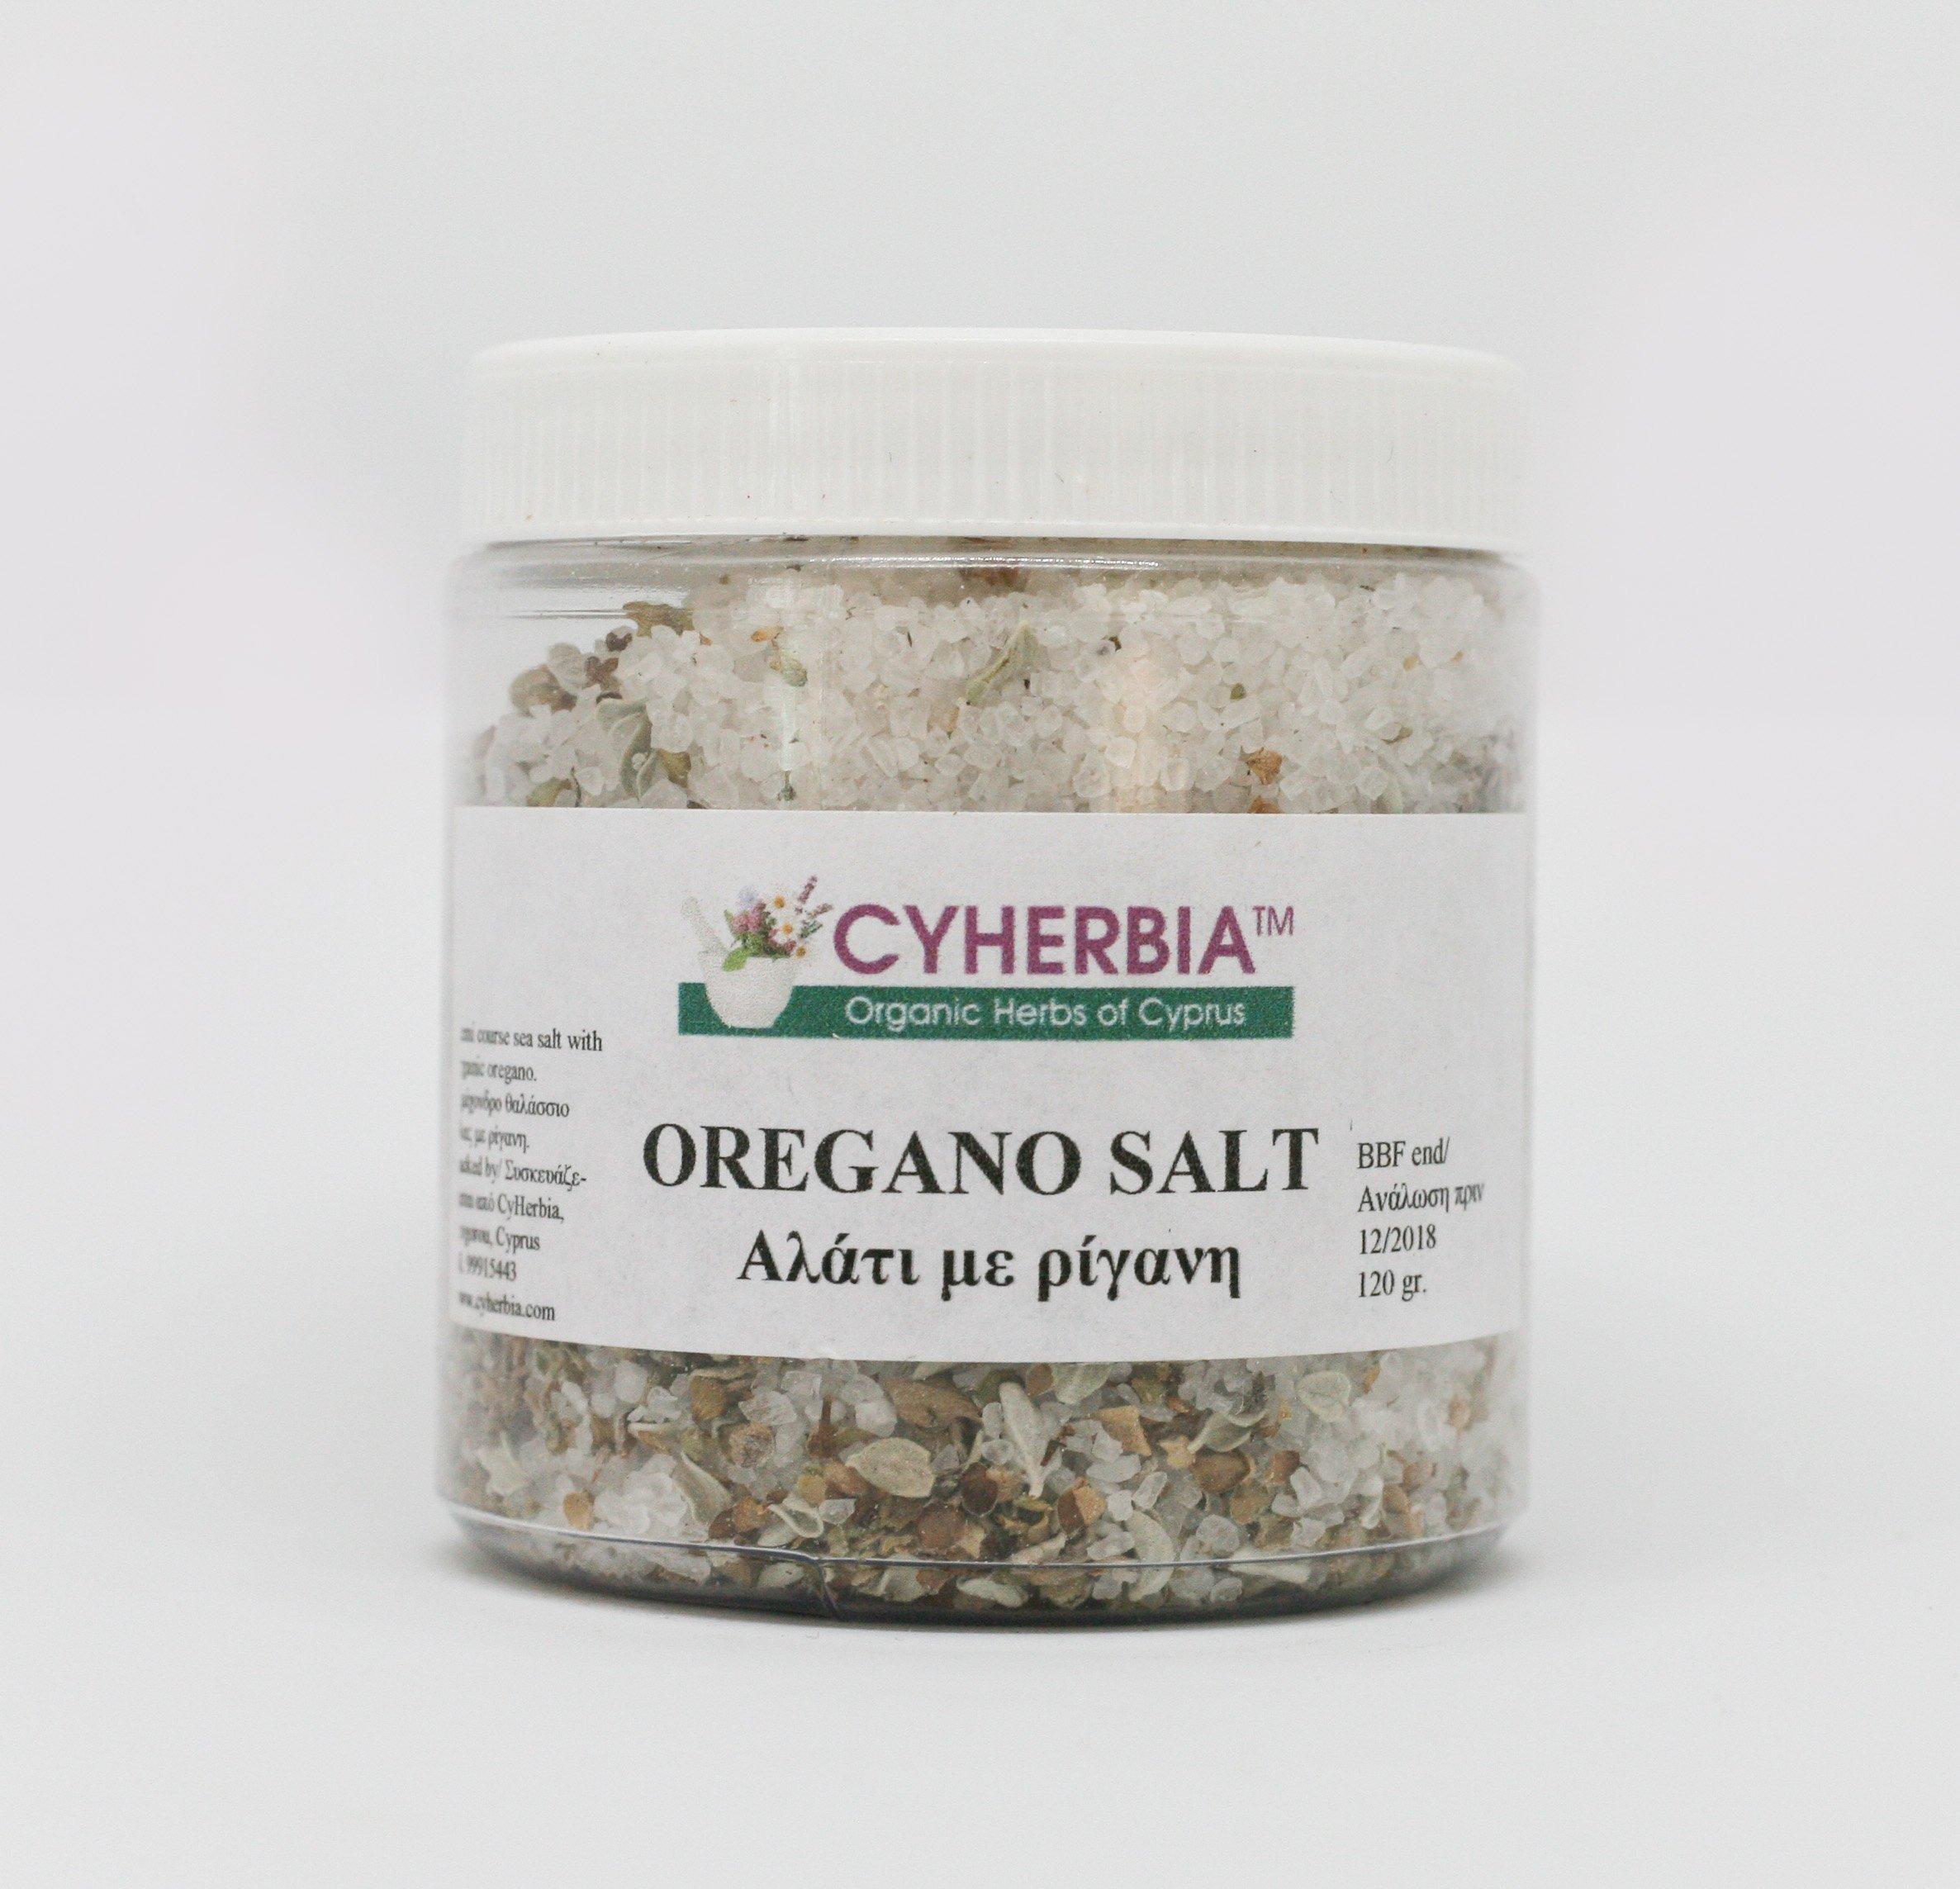 Oregano Salt